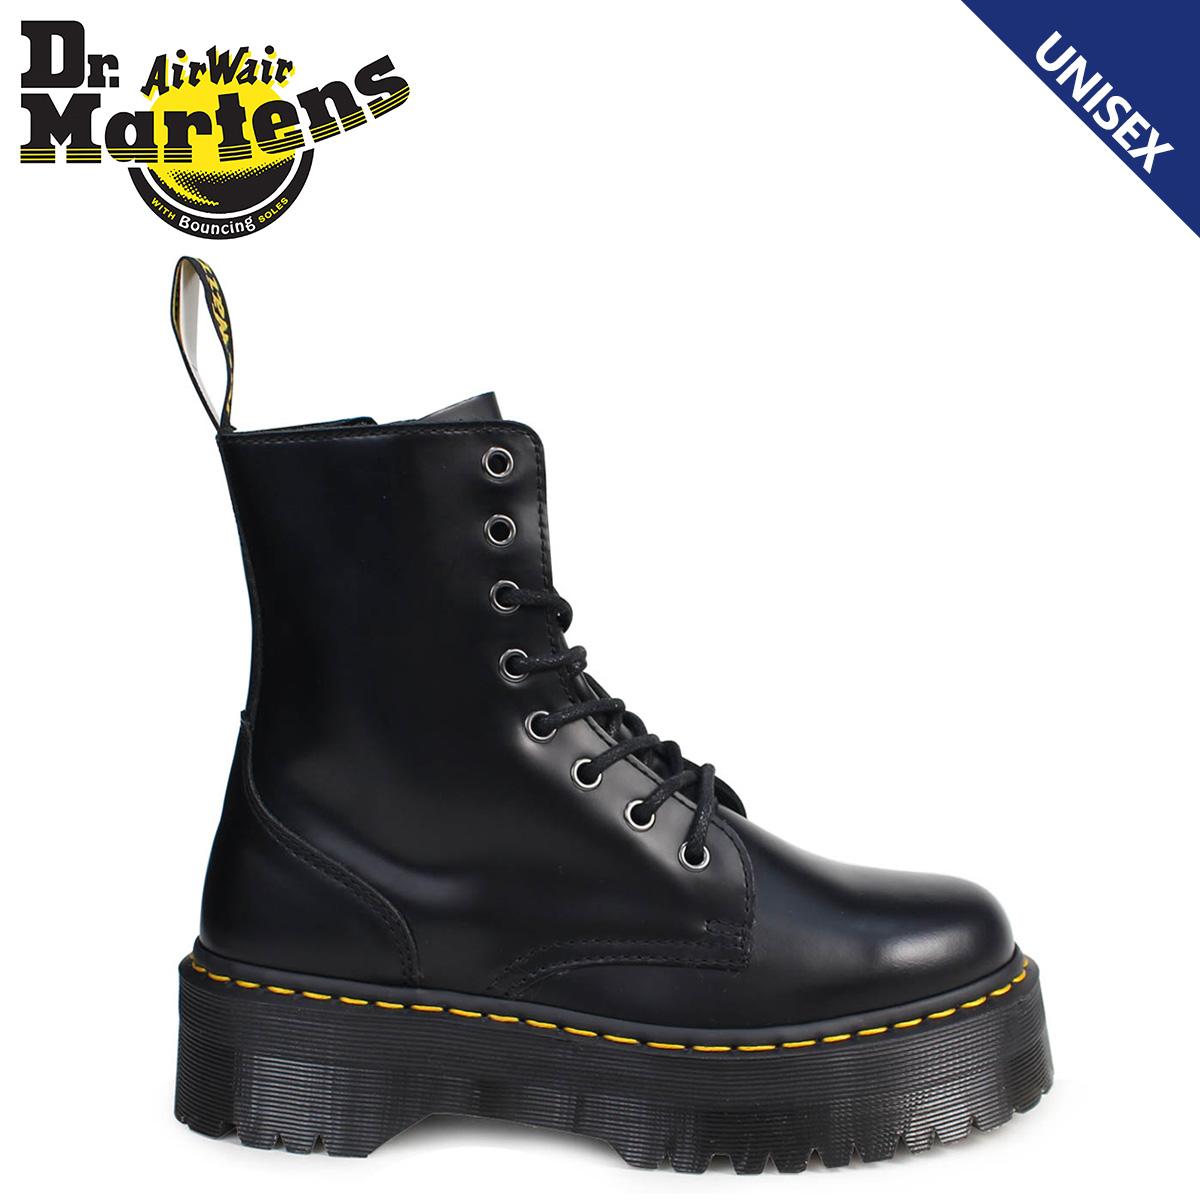 Dr.Martens ドクターマーチン 8ホール ブーツ JADON 8EYE BOOT R15265001 メンズ レディース